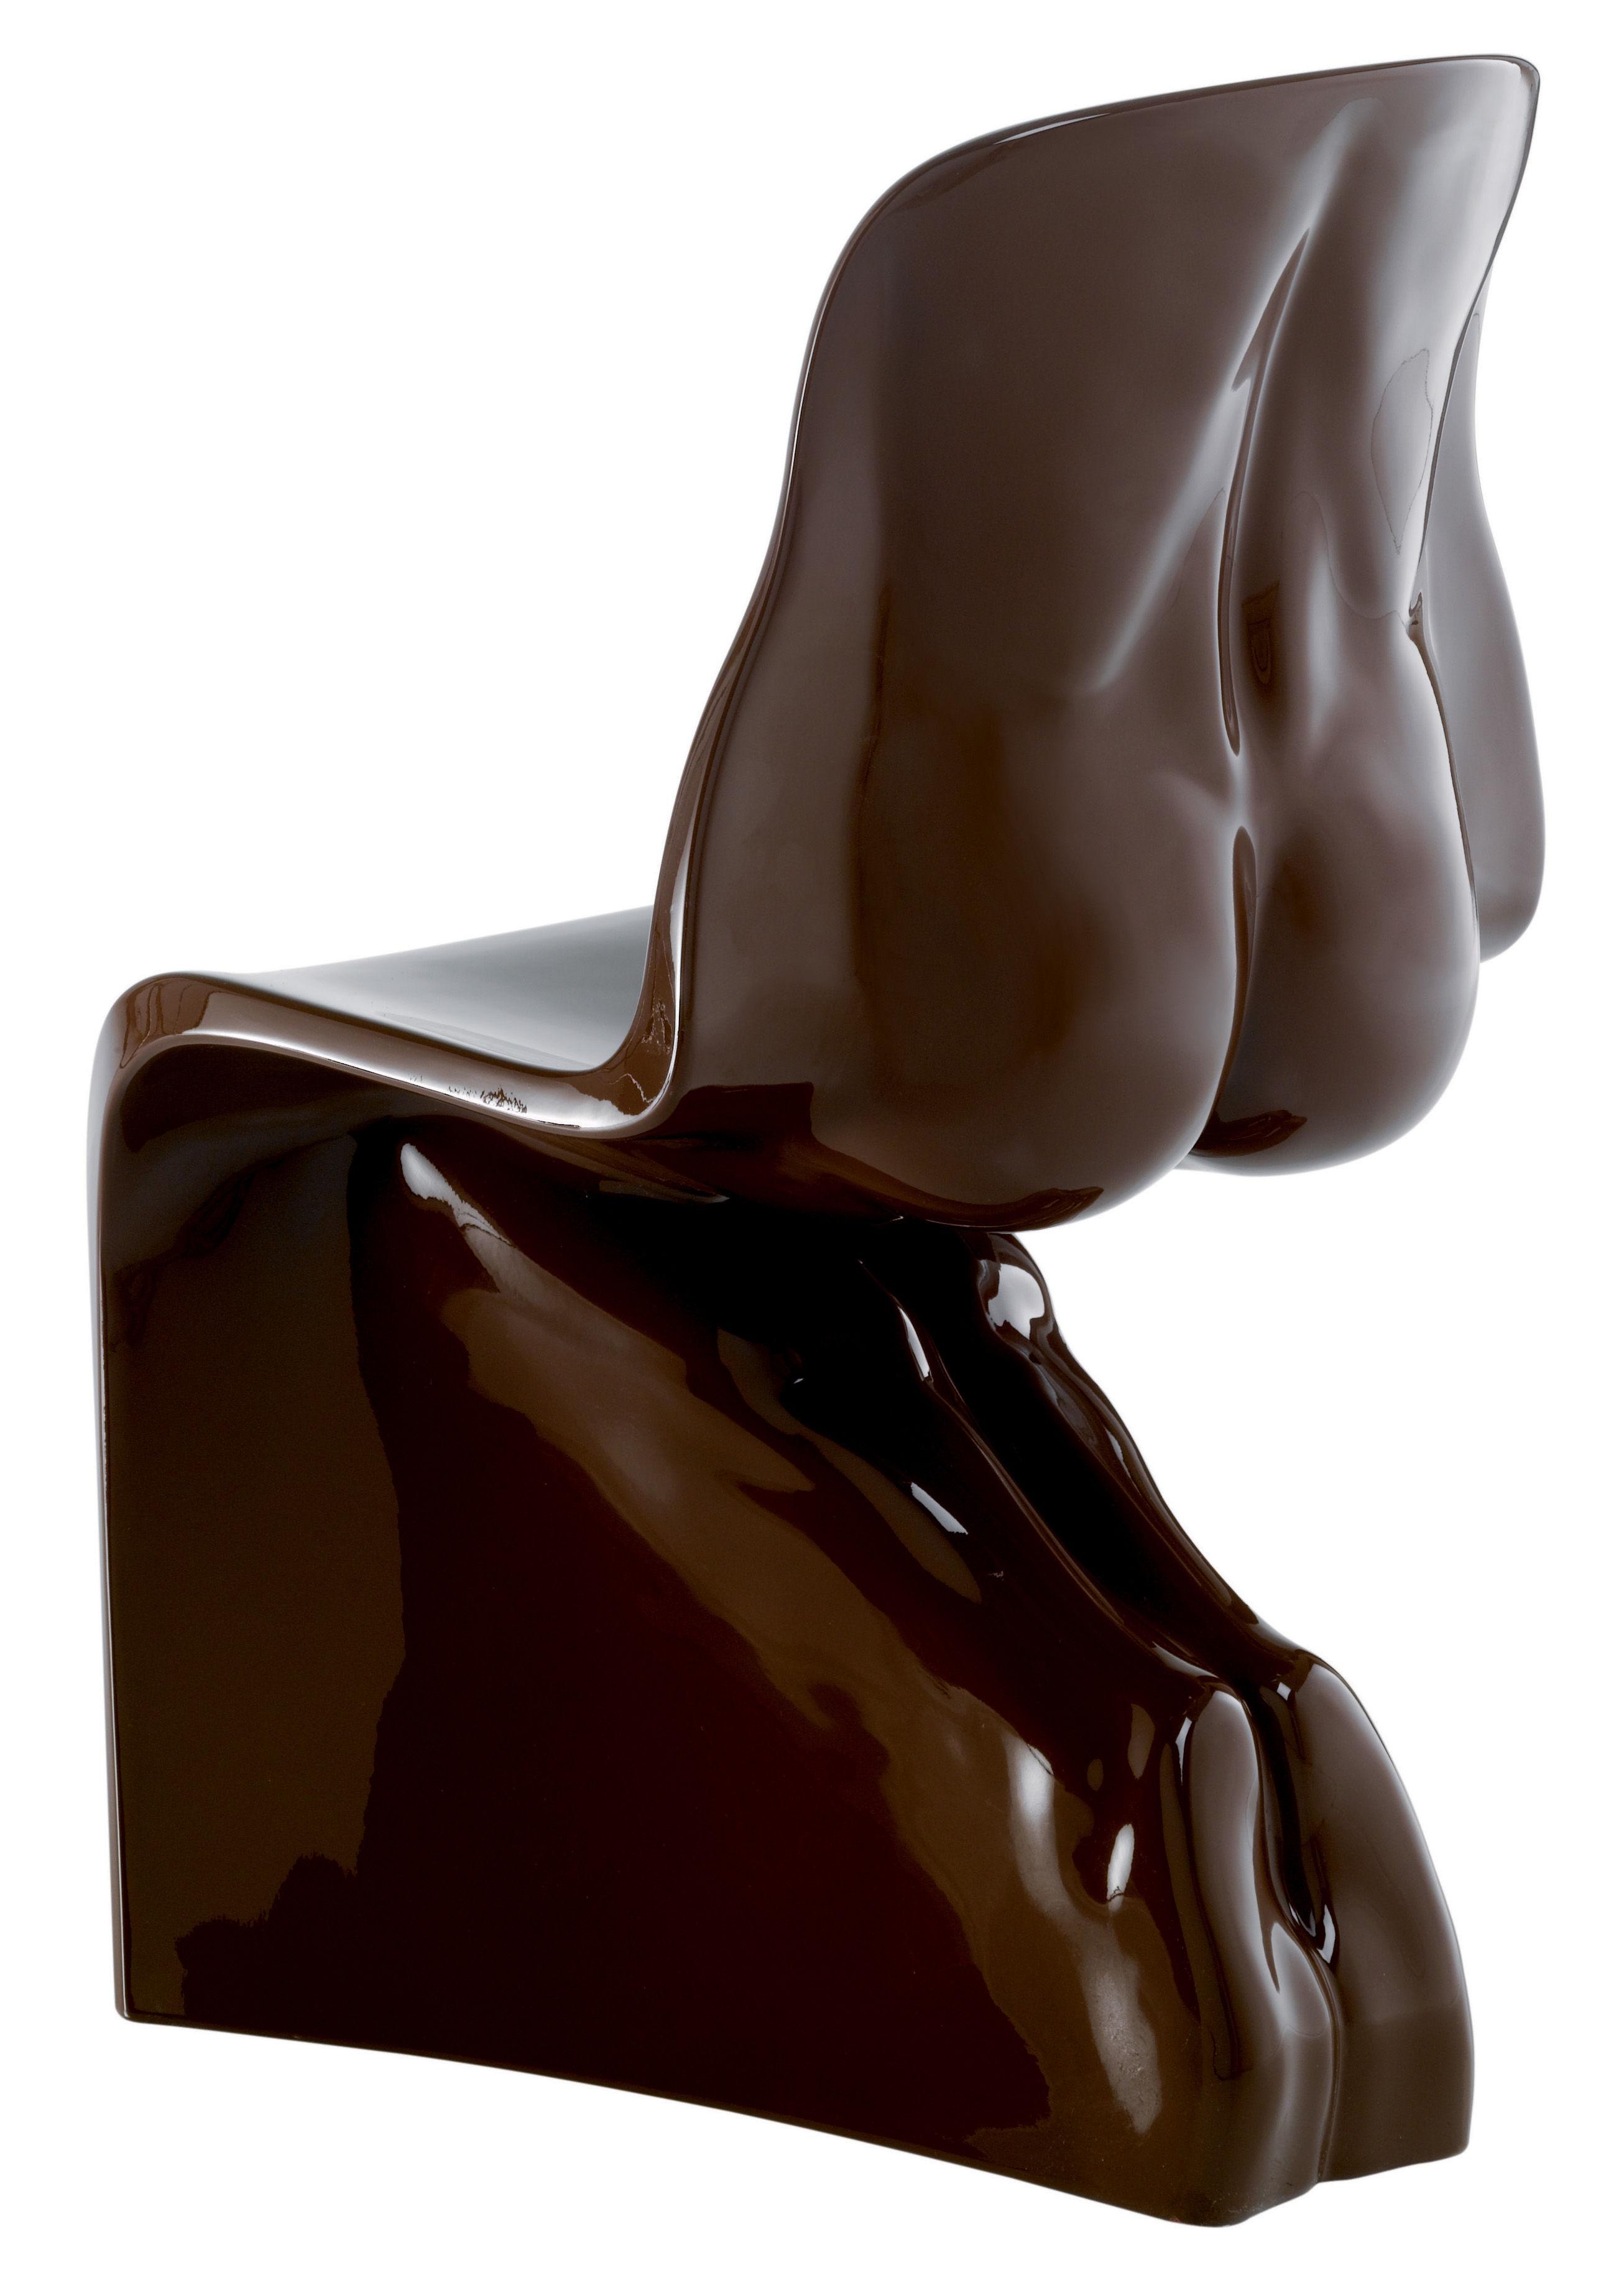 Möbel - Stühle  - Him Stuhl lackiert - Casamania - Braun - Polyäthylen